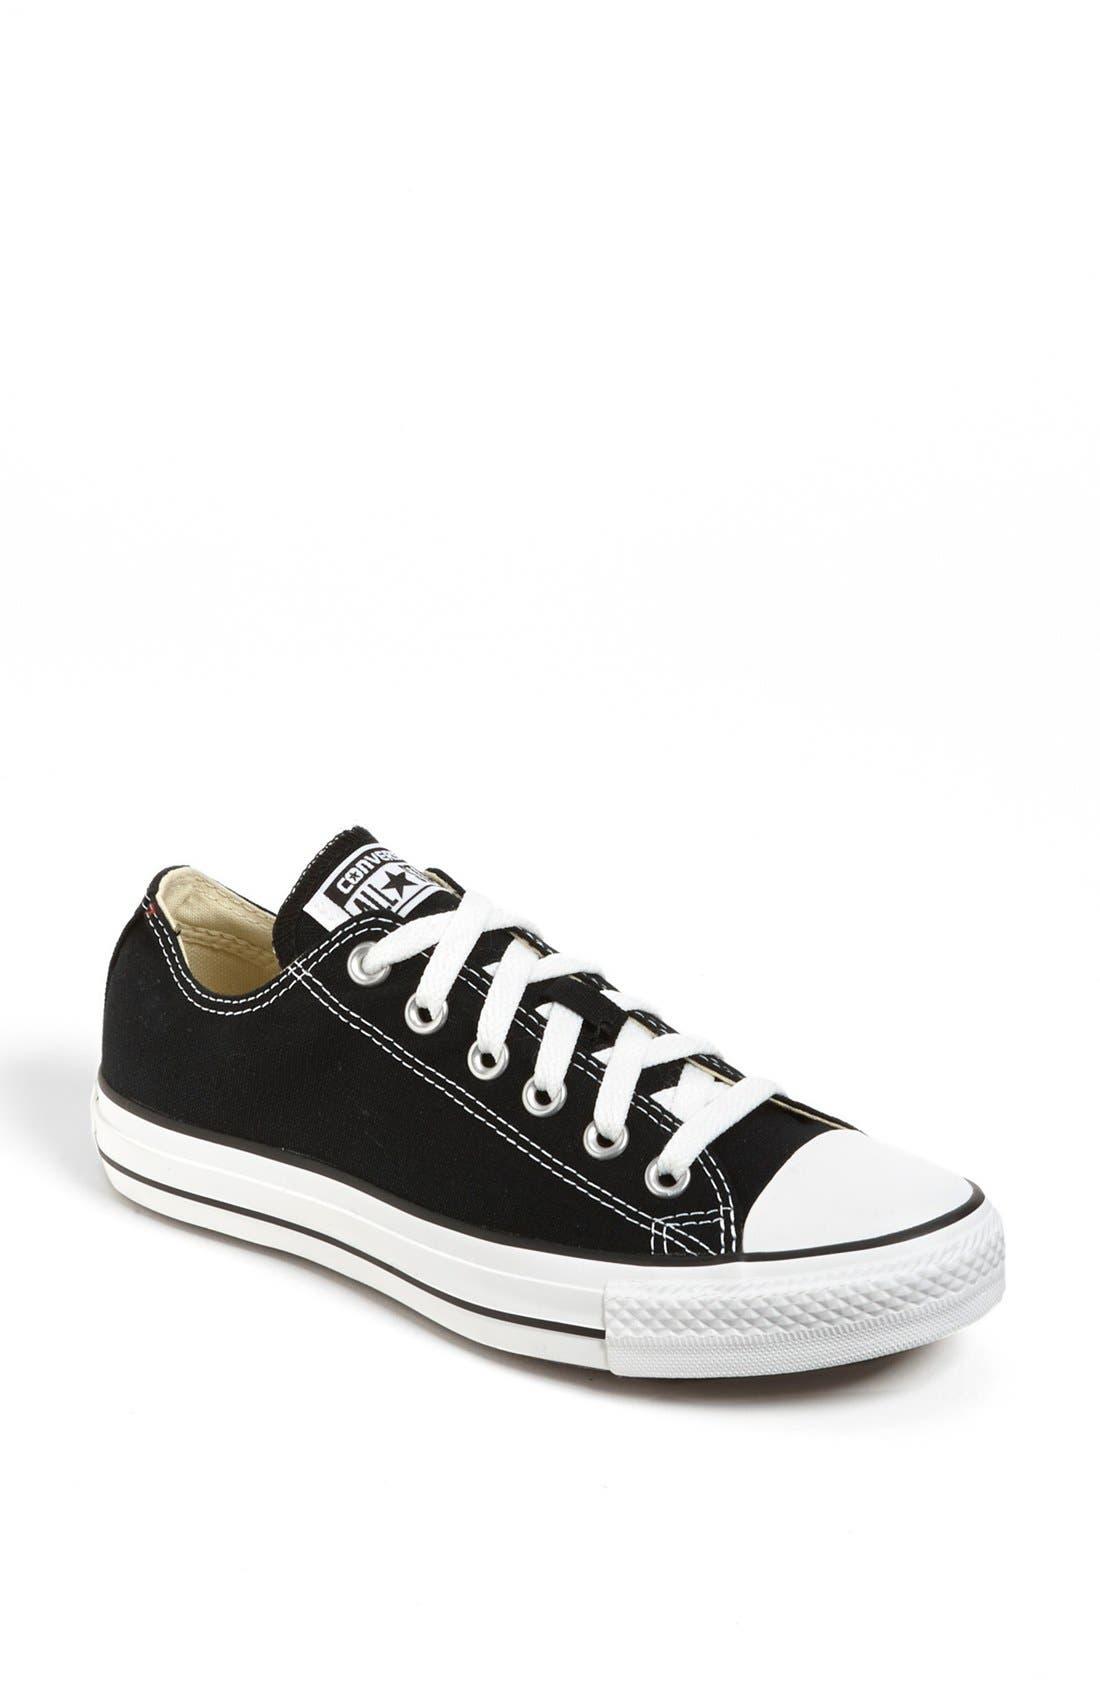 Converse Chuck Taylor Low Top Sneaker- Black